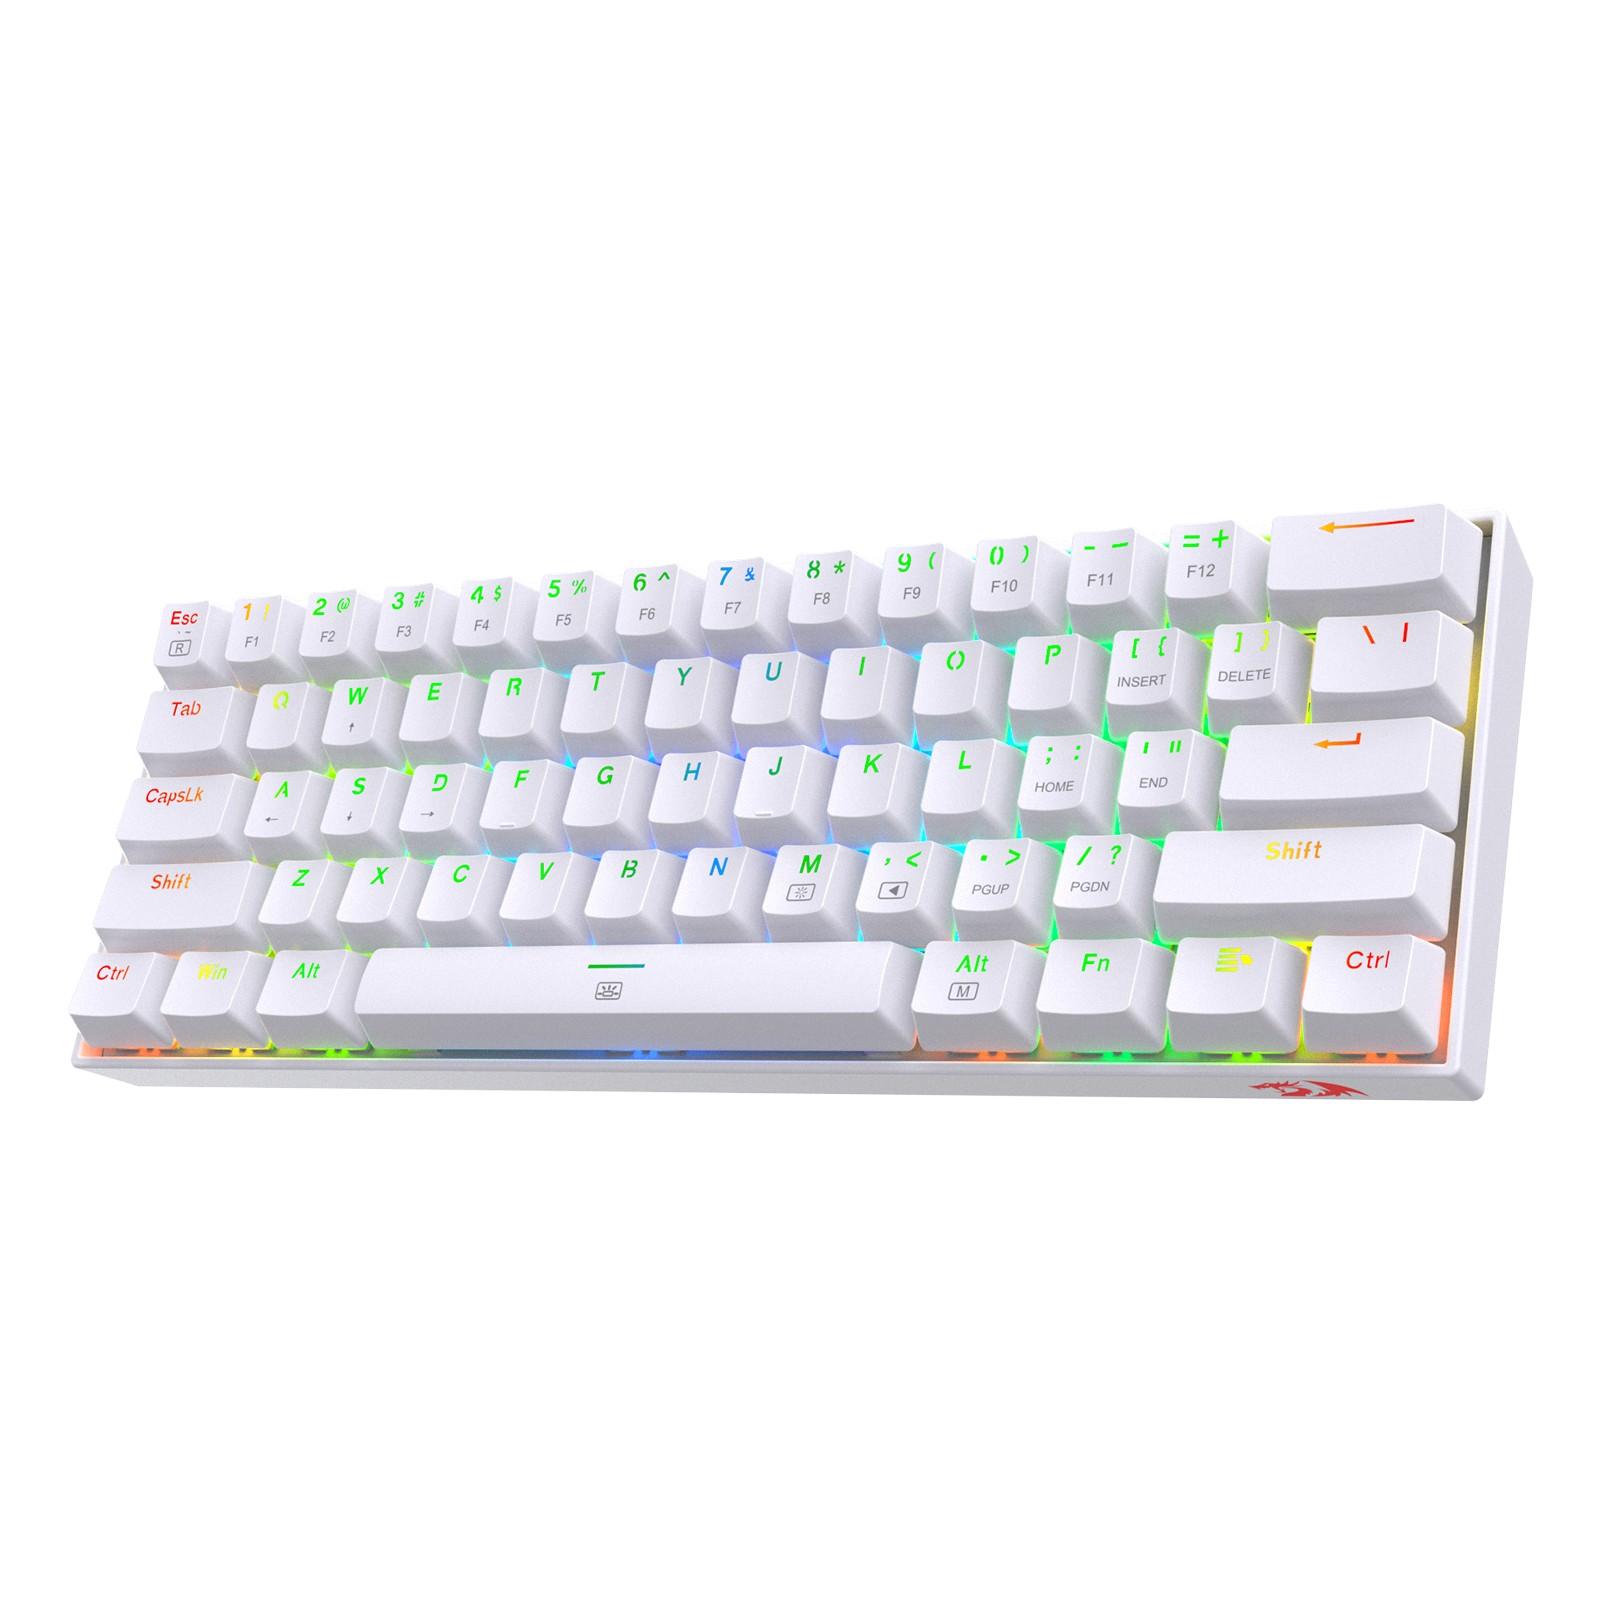 Redragon K630 60% RGB Wired Mechanical Keyboard, Red Switch